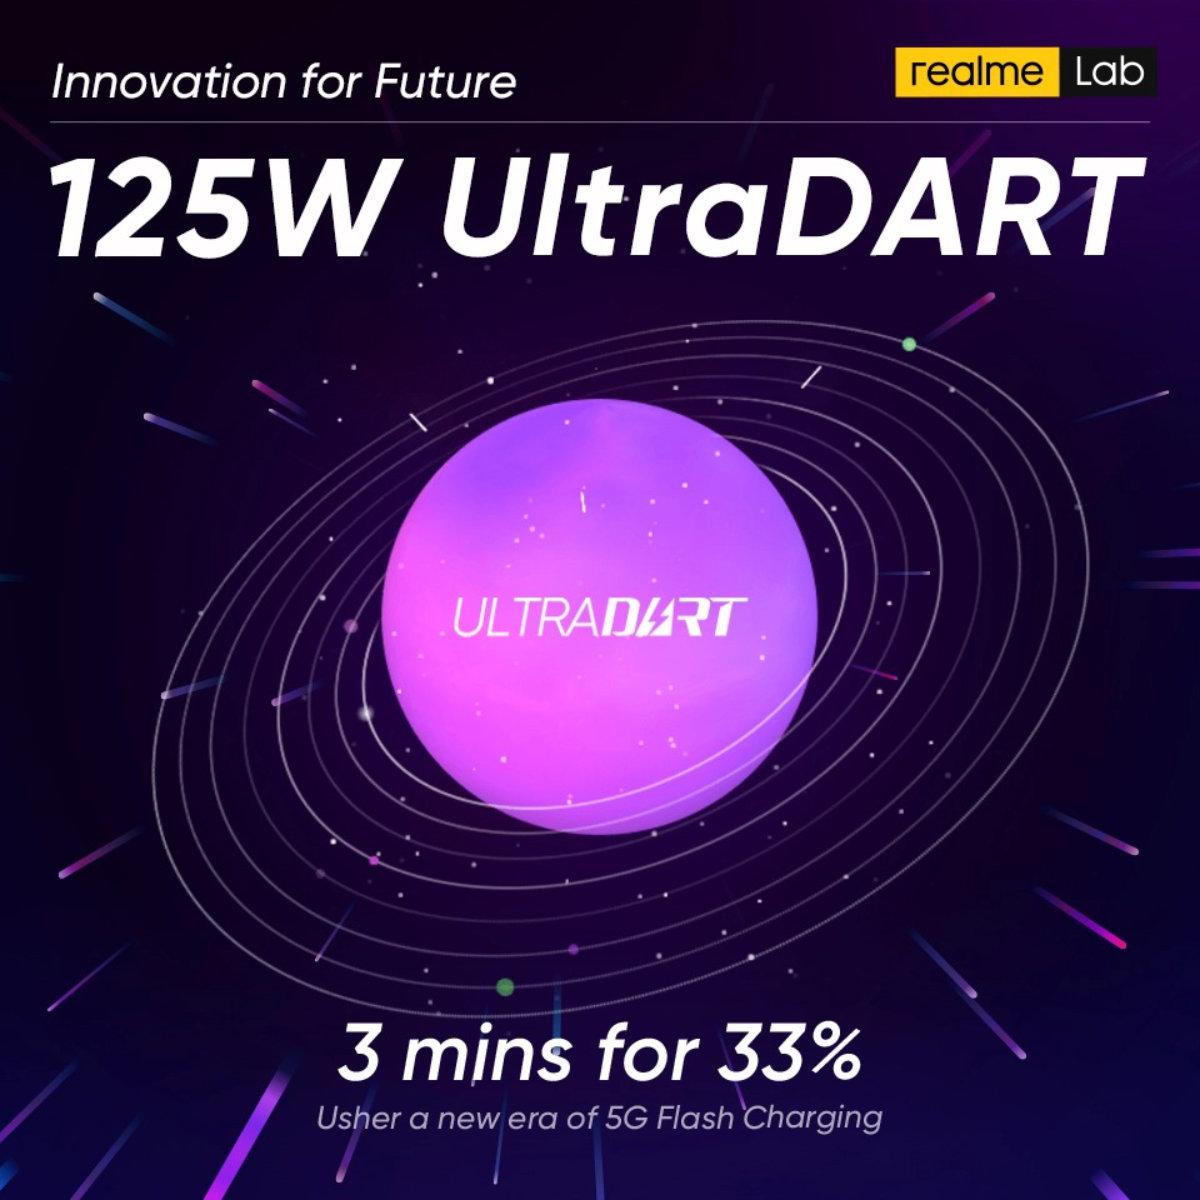 Realme UltraDART 125 W